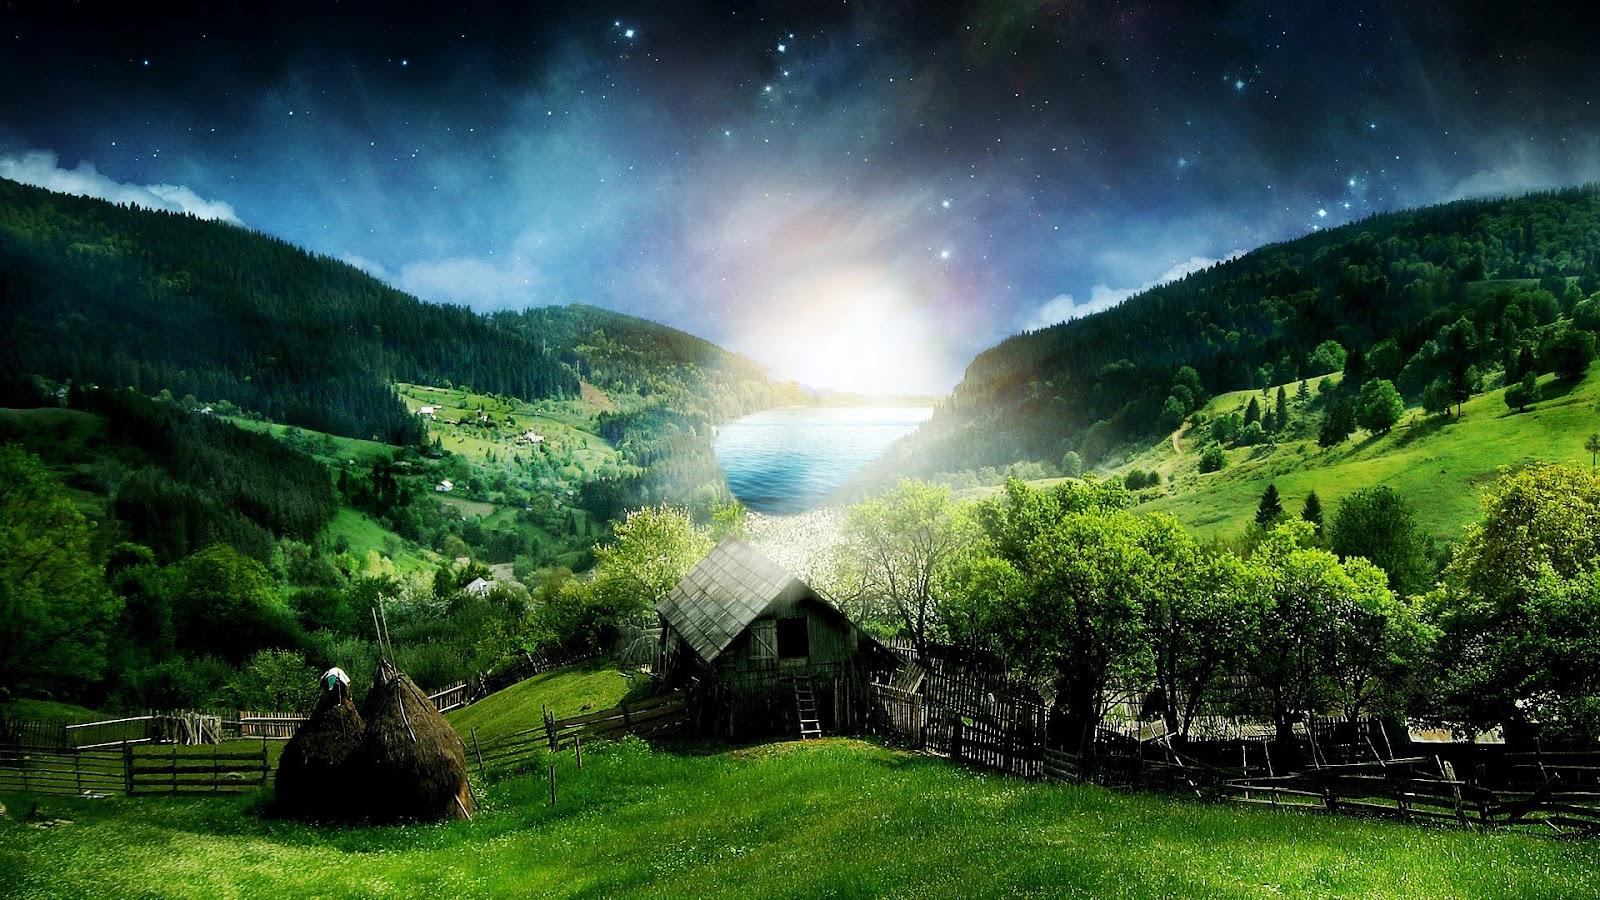 http://4.bp.blogspot.com/-CPNrjtSDvXE/T61iQprjf6I/AAAAAAAAAgk/_L01RTULvsA/s1600/supper-hd-nature-widesreen-wallpaper-moonlight-1920x1080.jpg